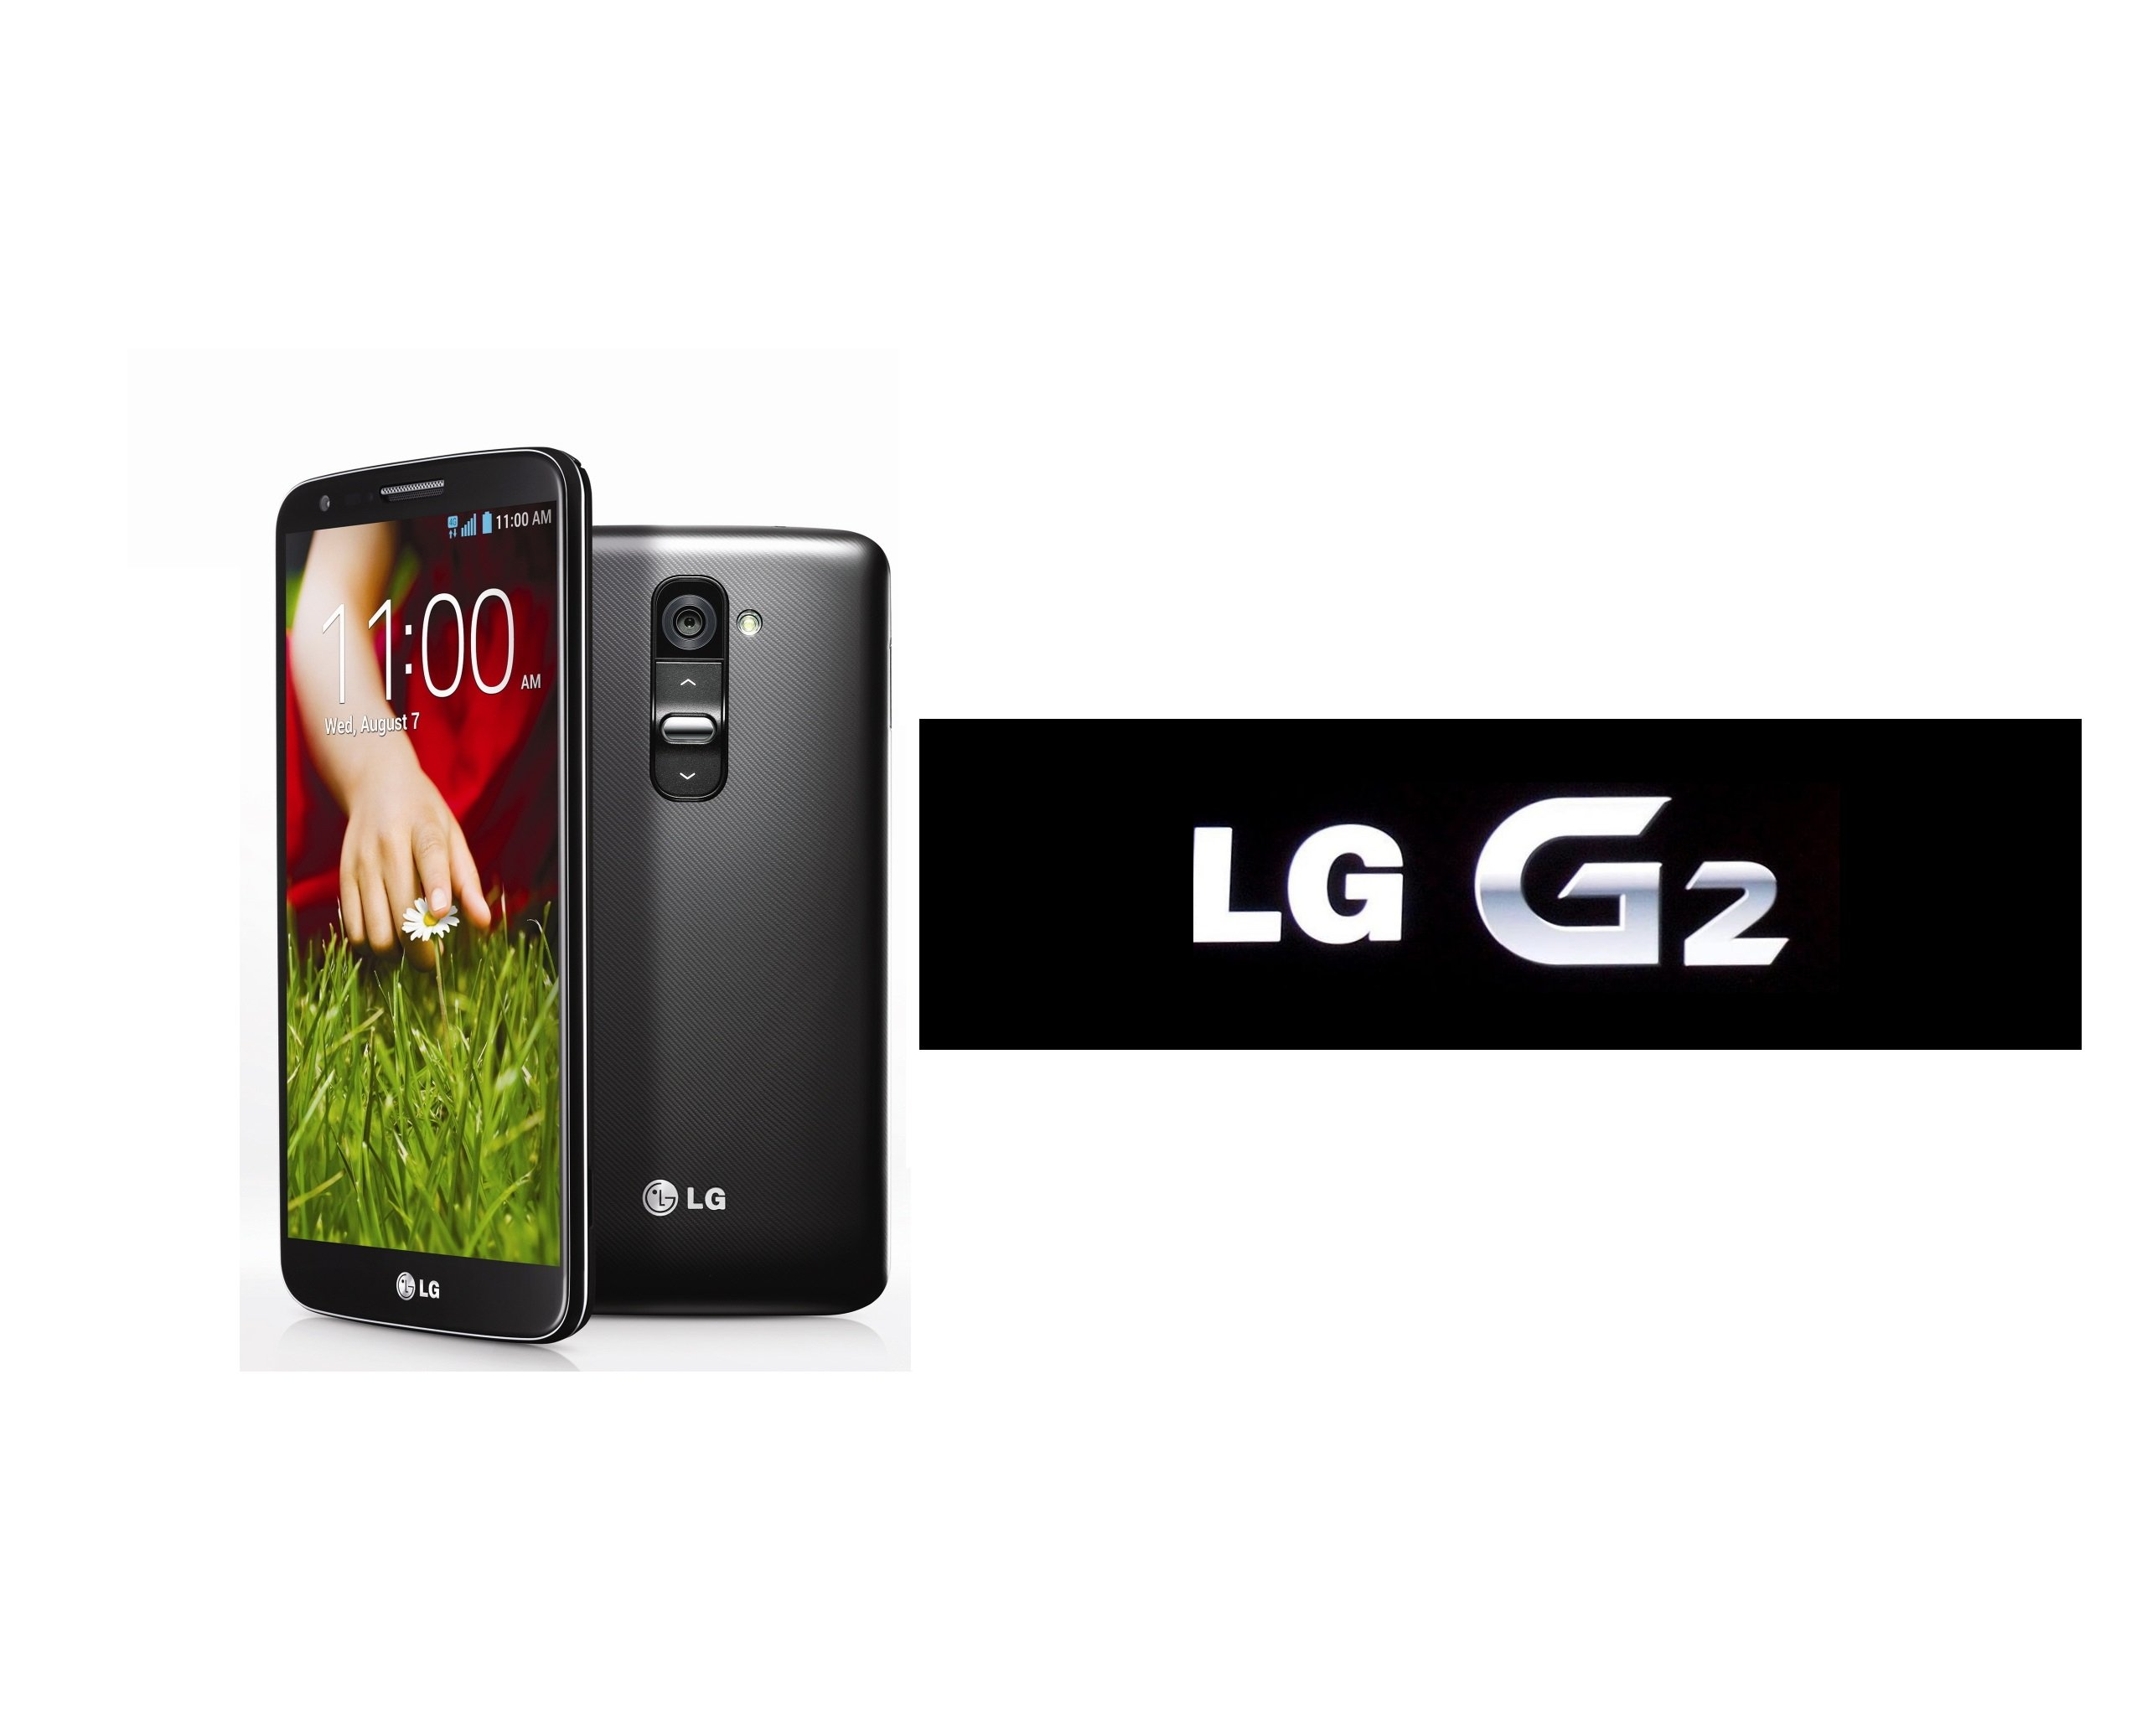 LG unveils its latest smartphone LG G2